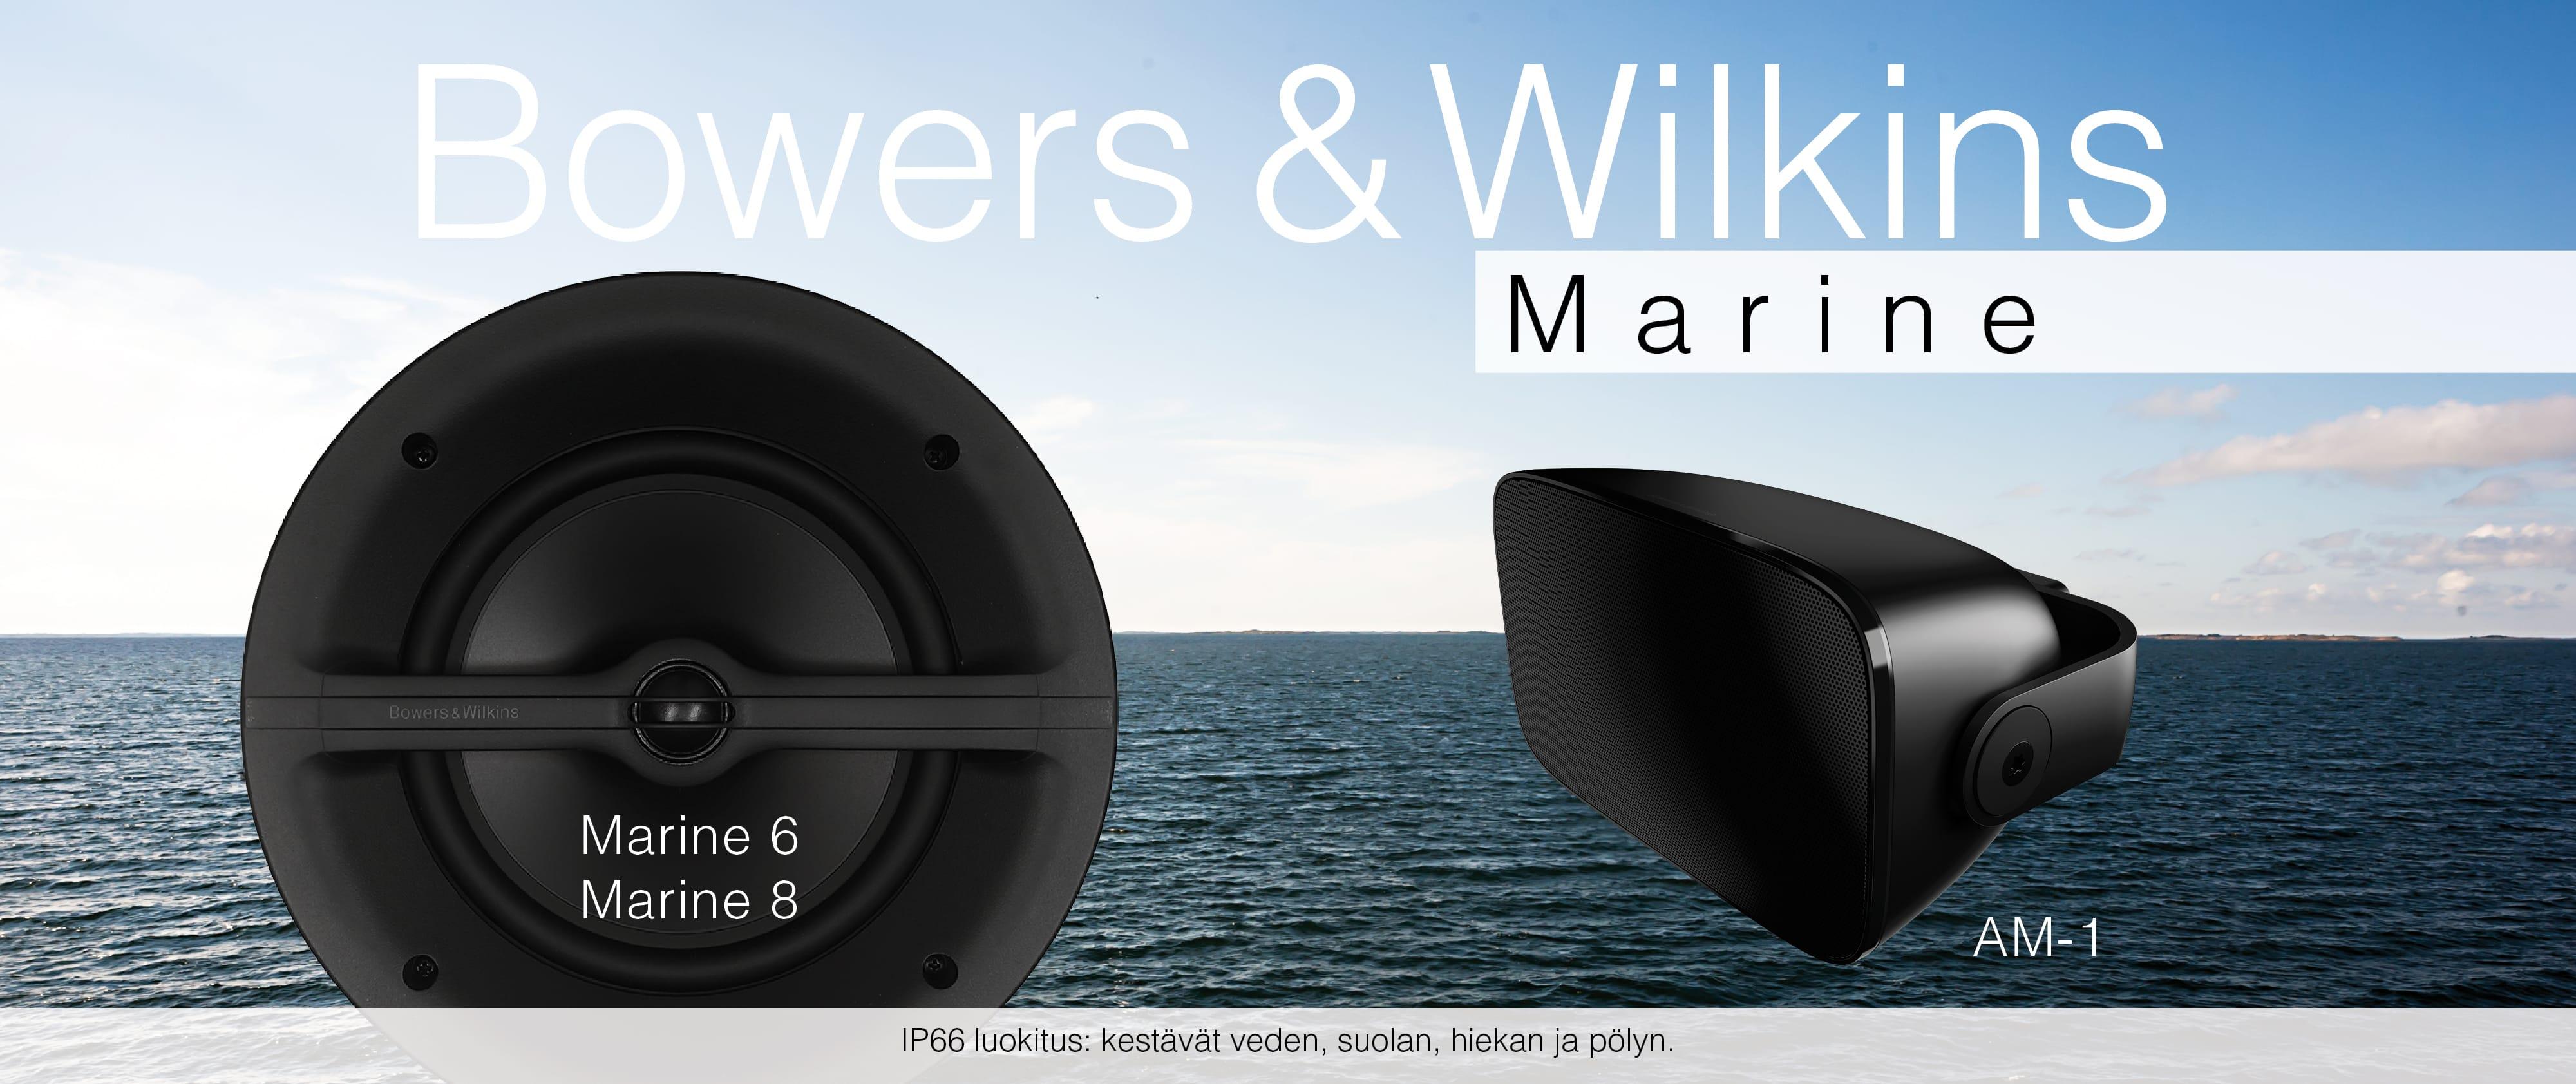 Bowers & Wilkins Marine